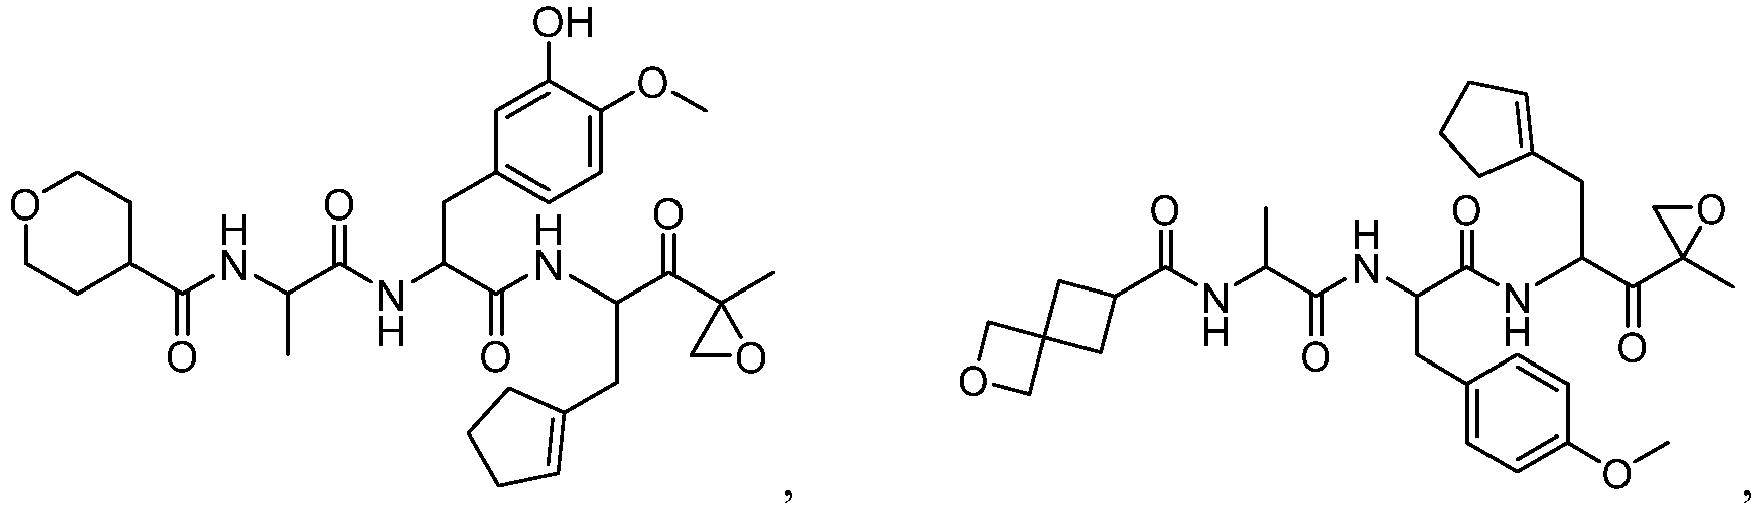 EP2970224B1 - Tripeptide epoxy ketone protease inhibitors